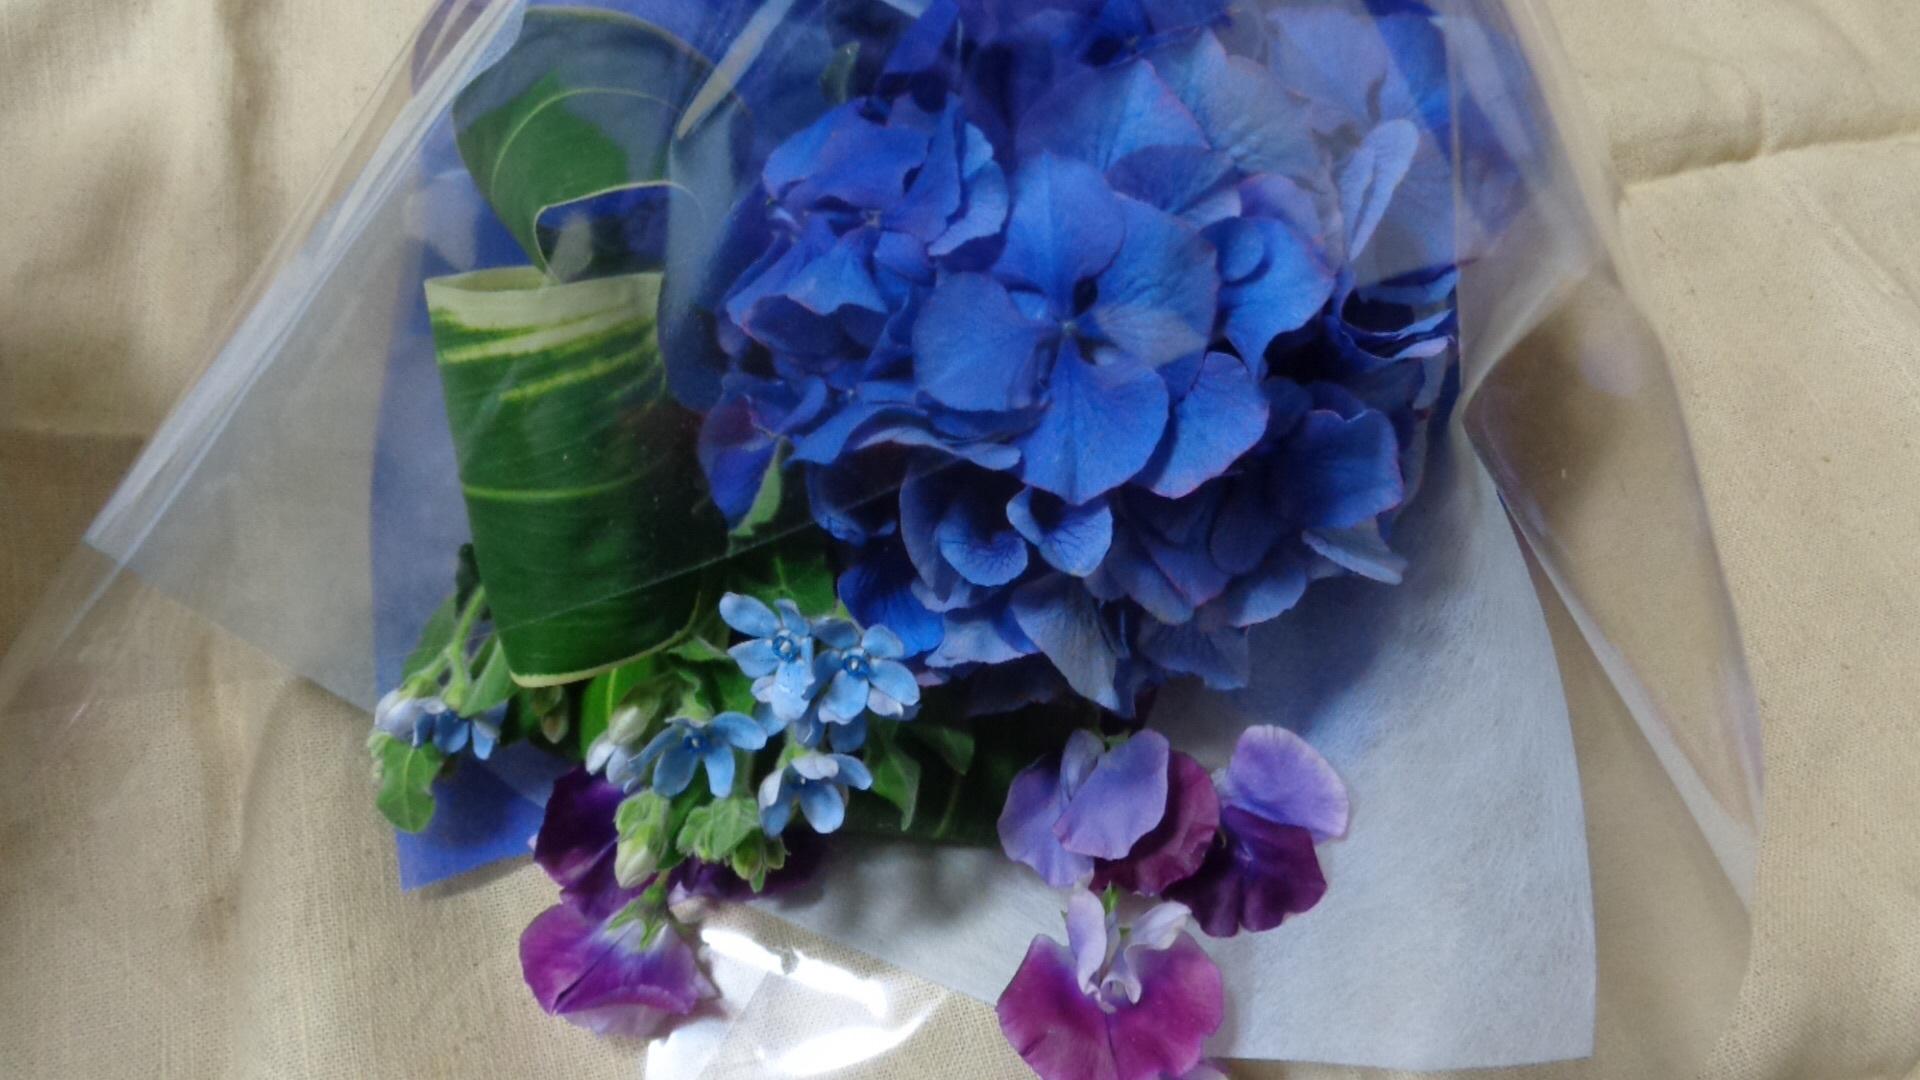 青い花束_a0025572_23544046.jpg